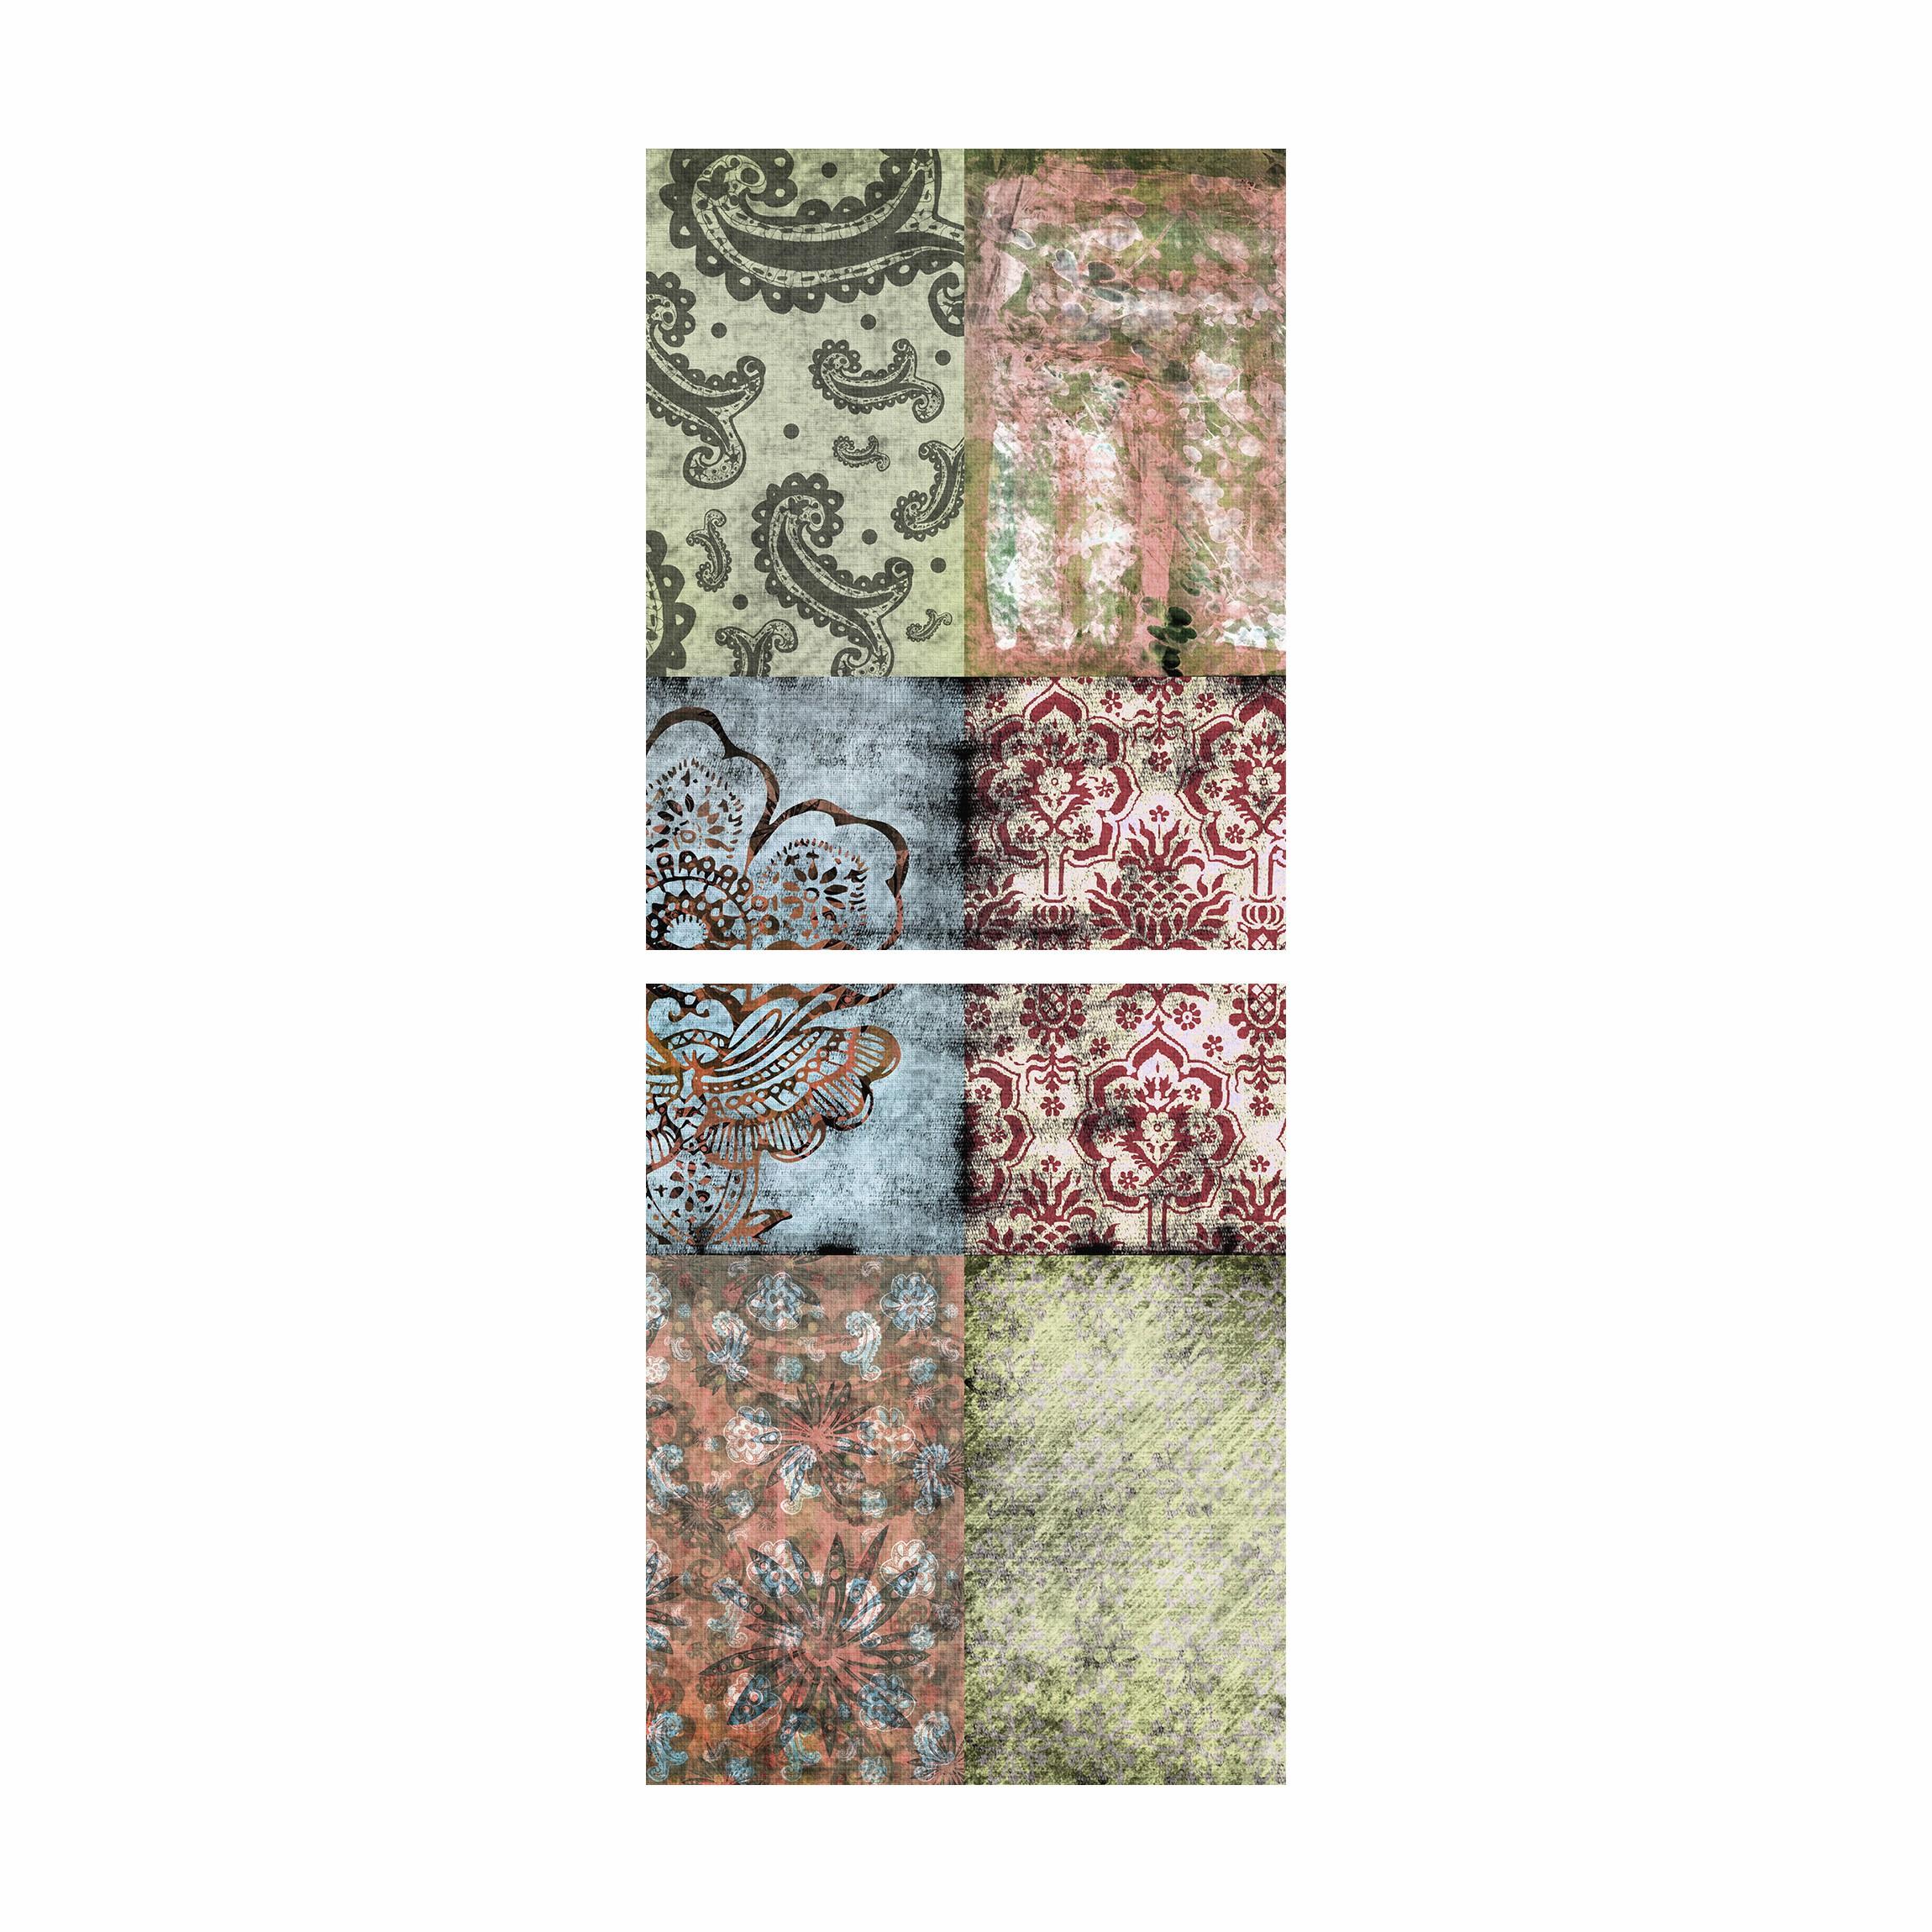 Furniture decal for ikea billy bookshelf old patterns for Carta adesiva per mobili ikea